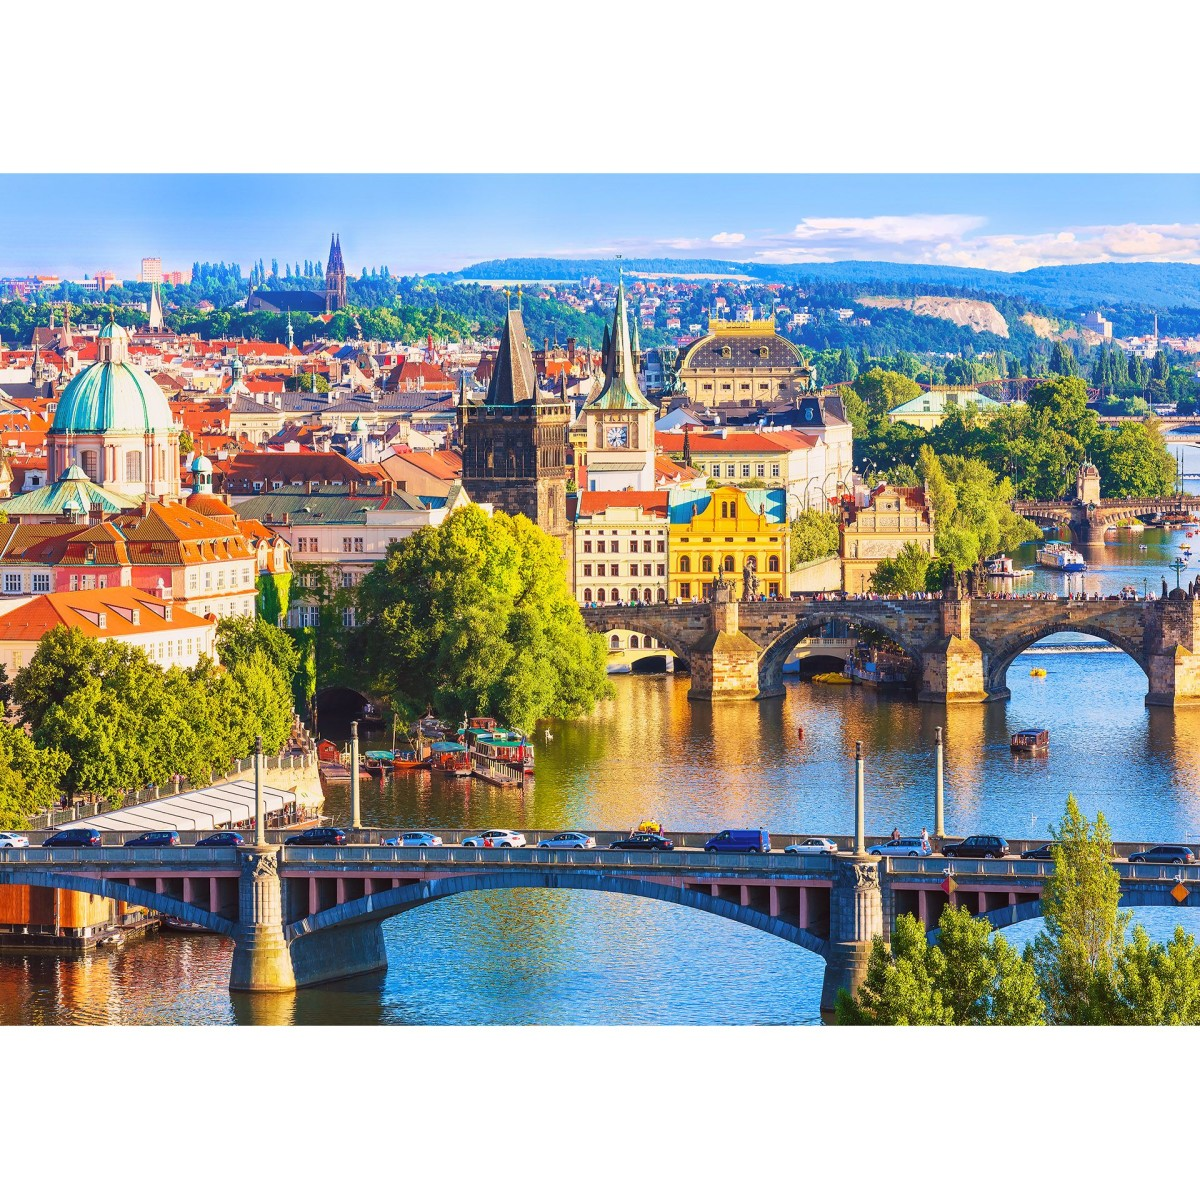 Фотообои МИР Прага MIR-2021-V4 380х270 см